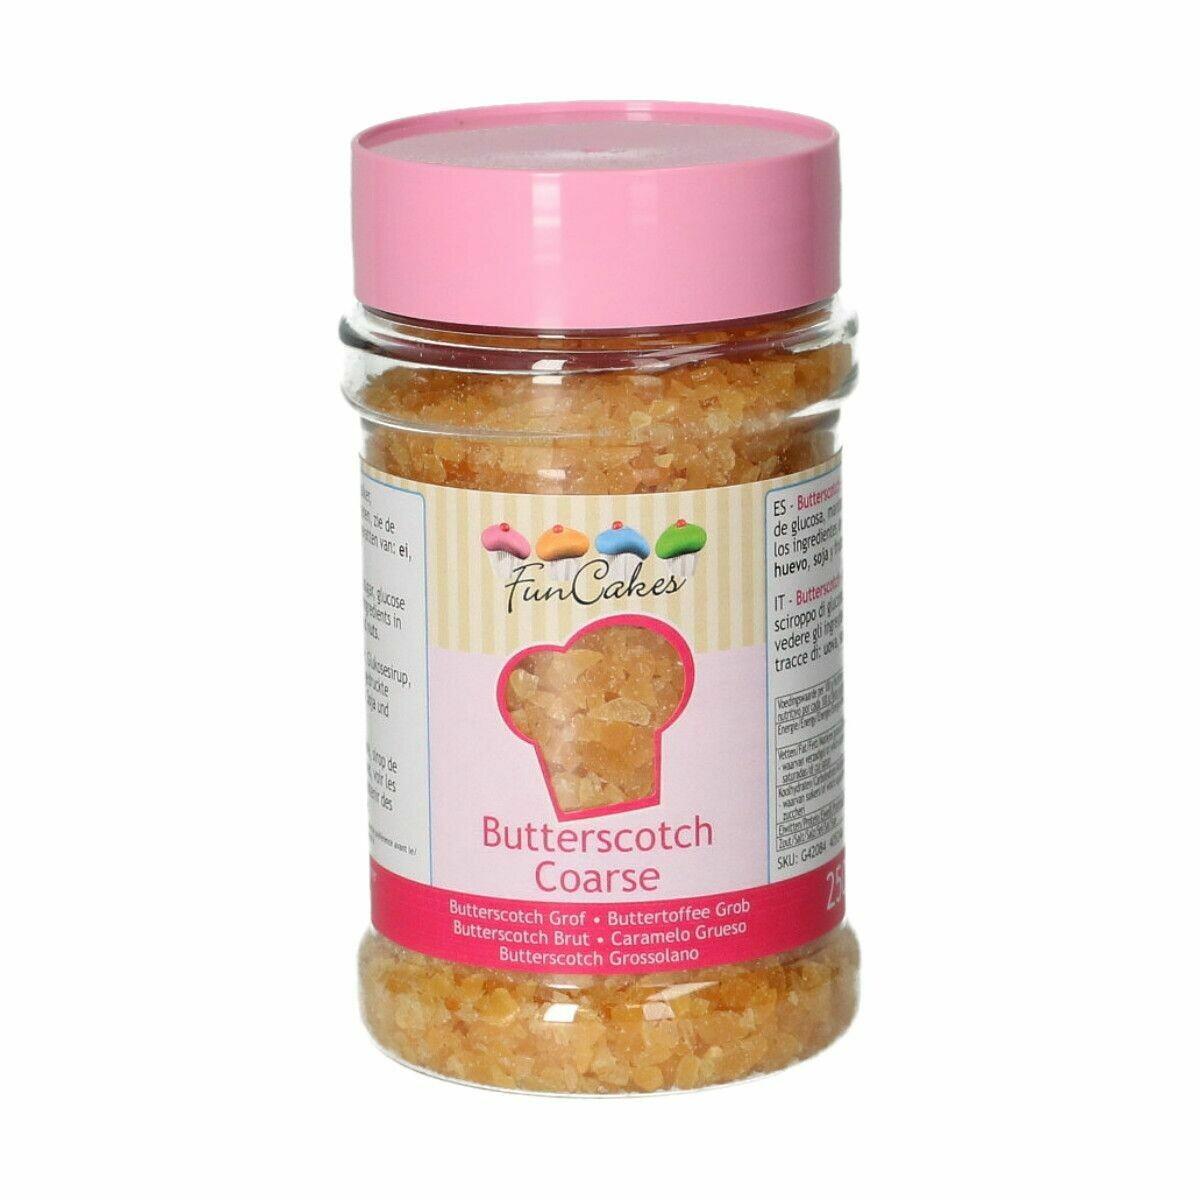 FunCakes Butterscotch COARSE 250g - Καραμέλα Βουτύρου σε τρίμμα